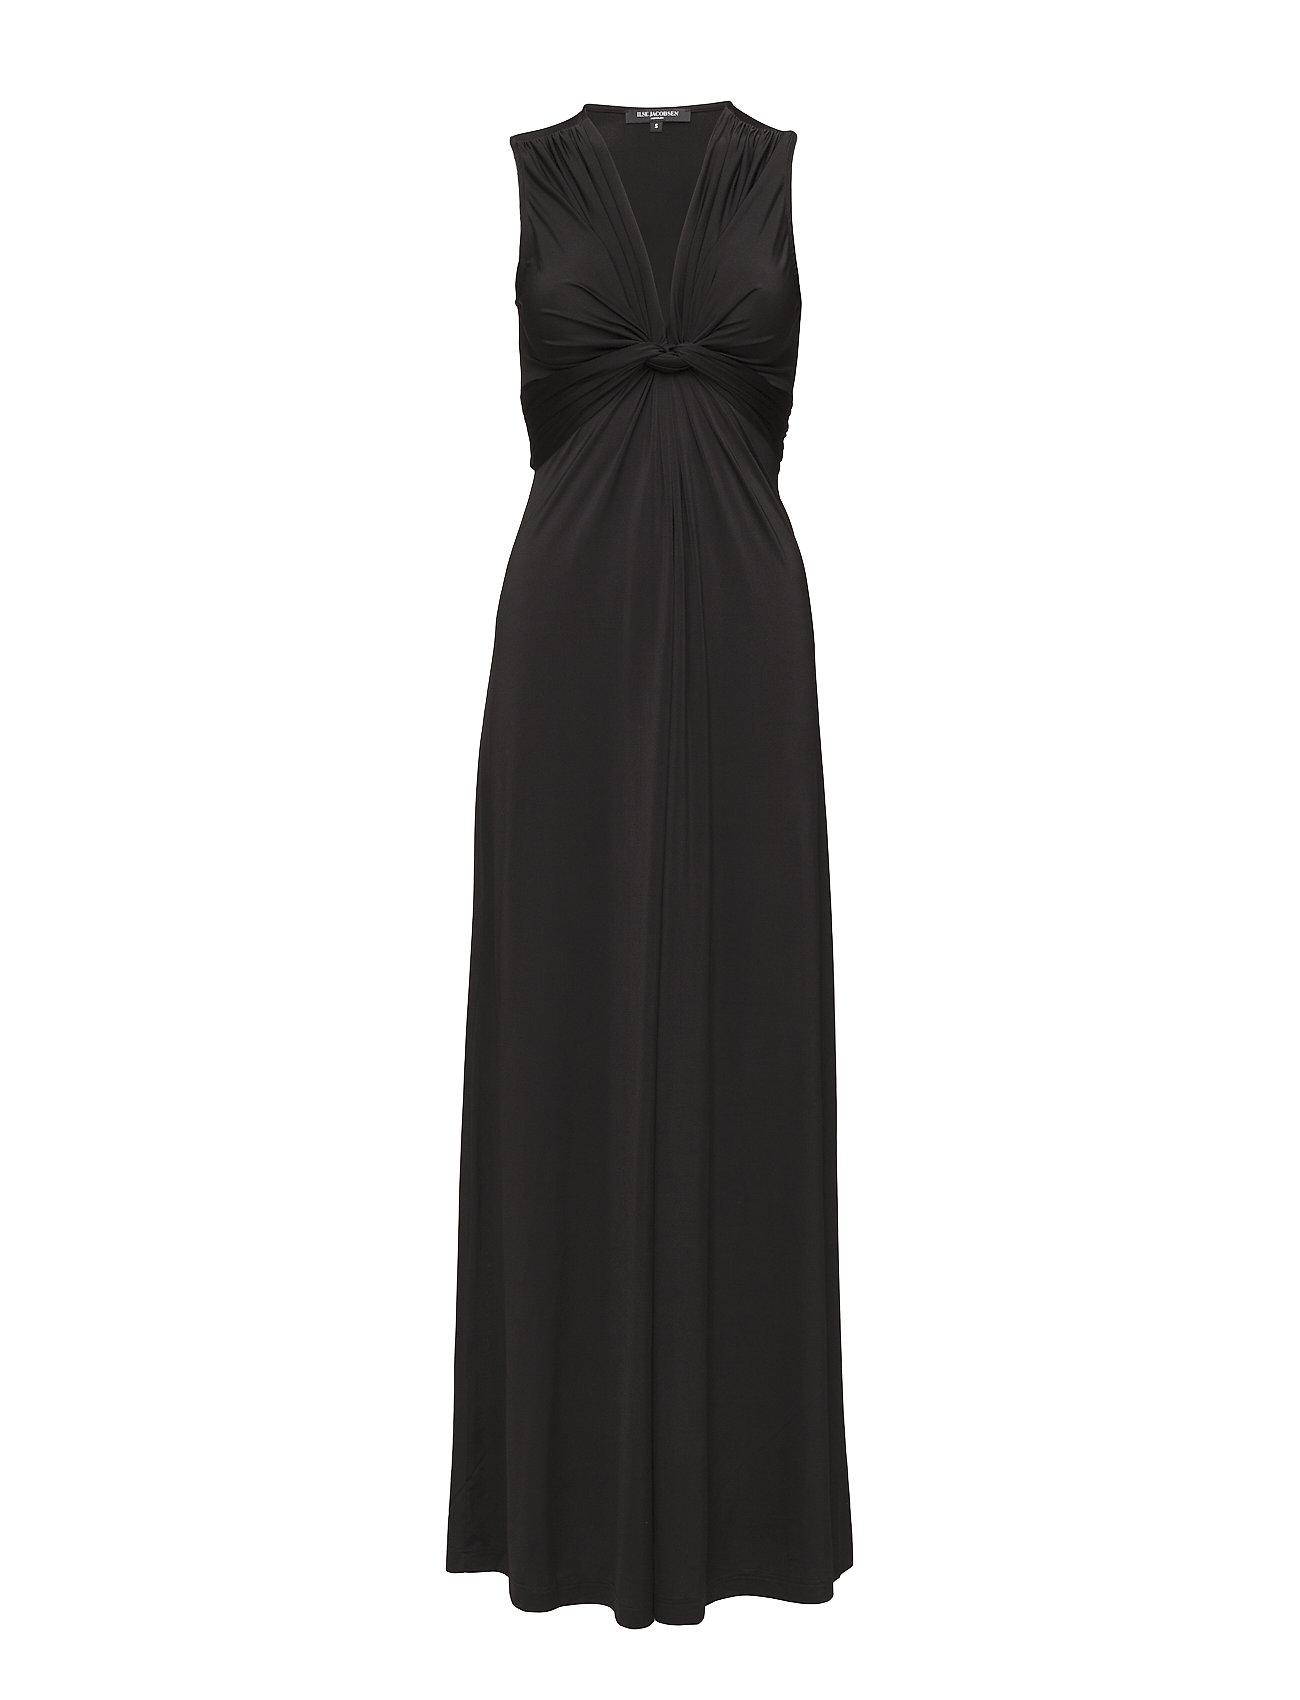 Ilse Jacobsen WOMENS LONG DRESS - 001 Black